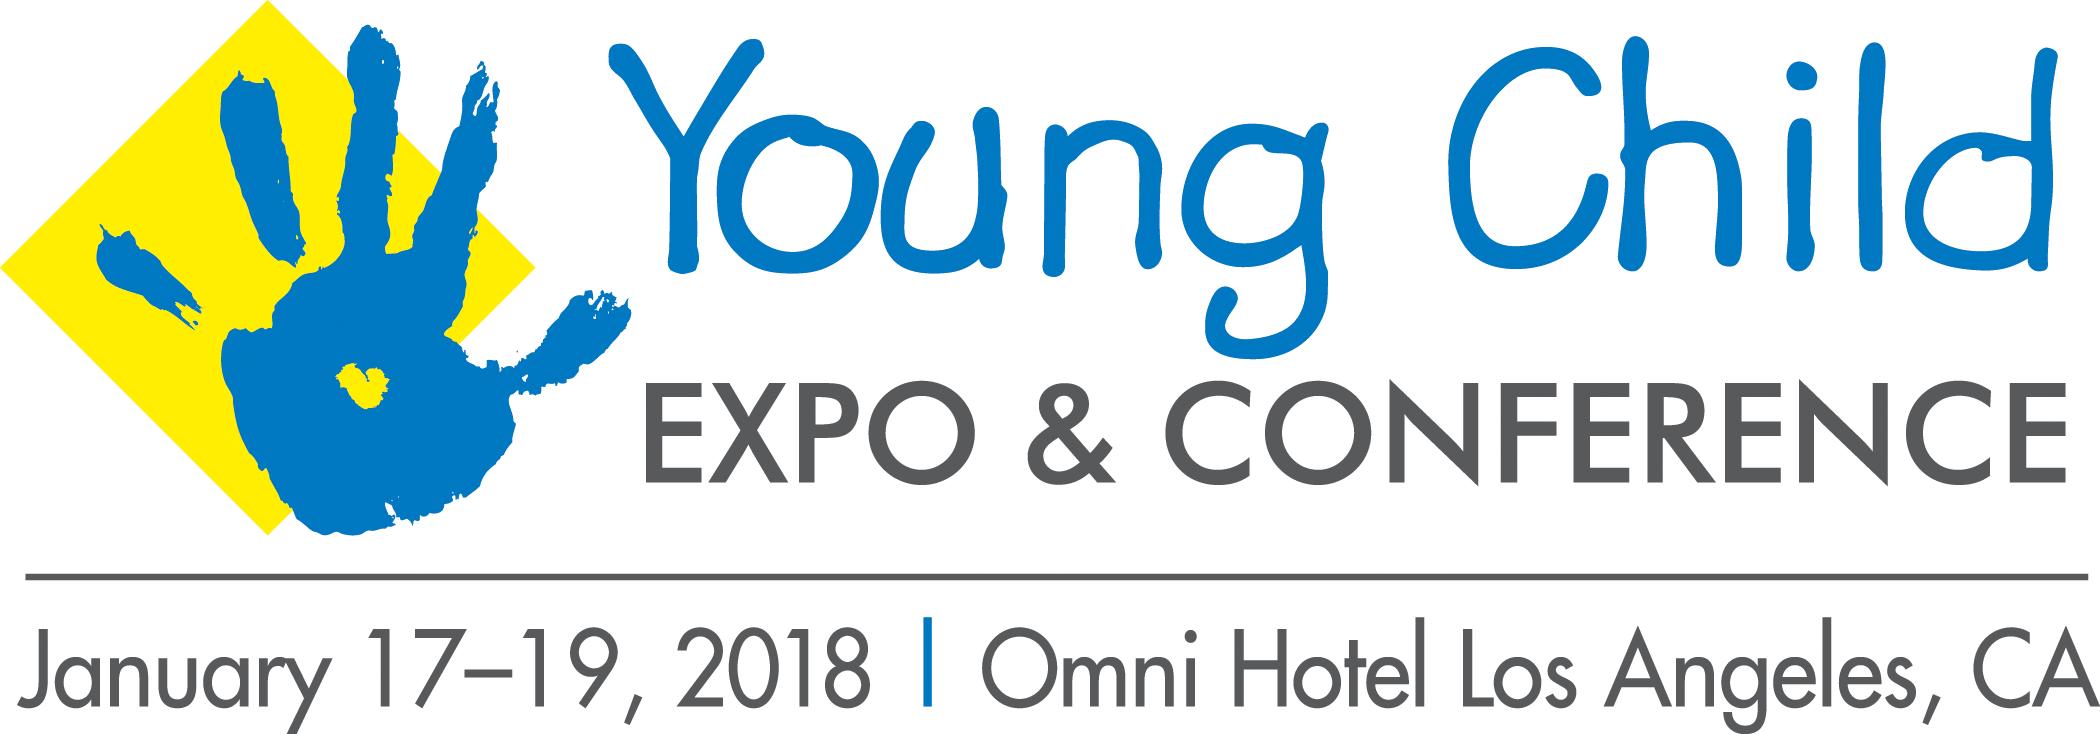 YCE LA 2018 Logo